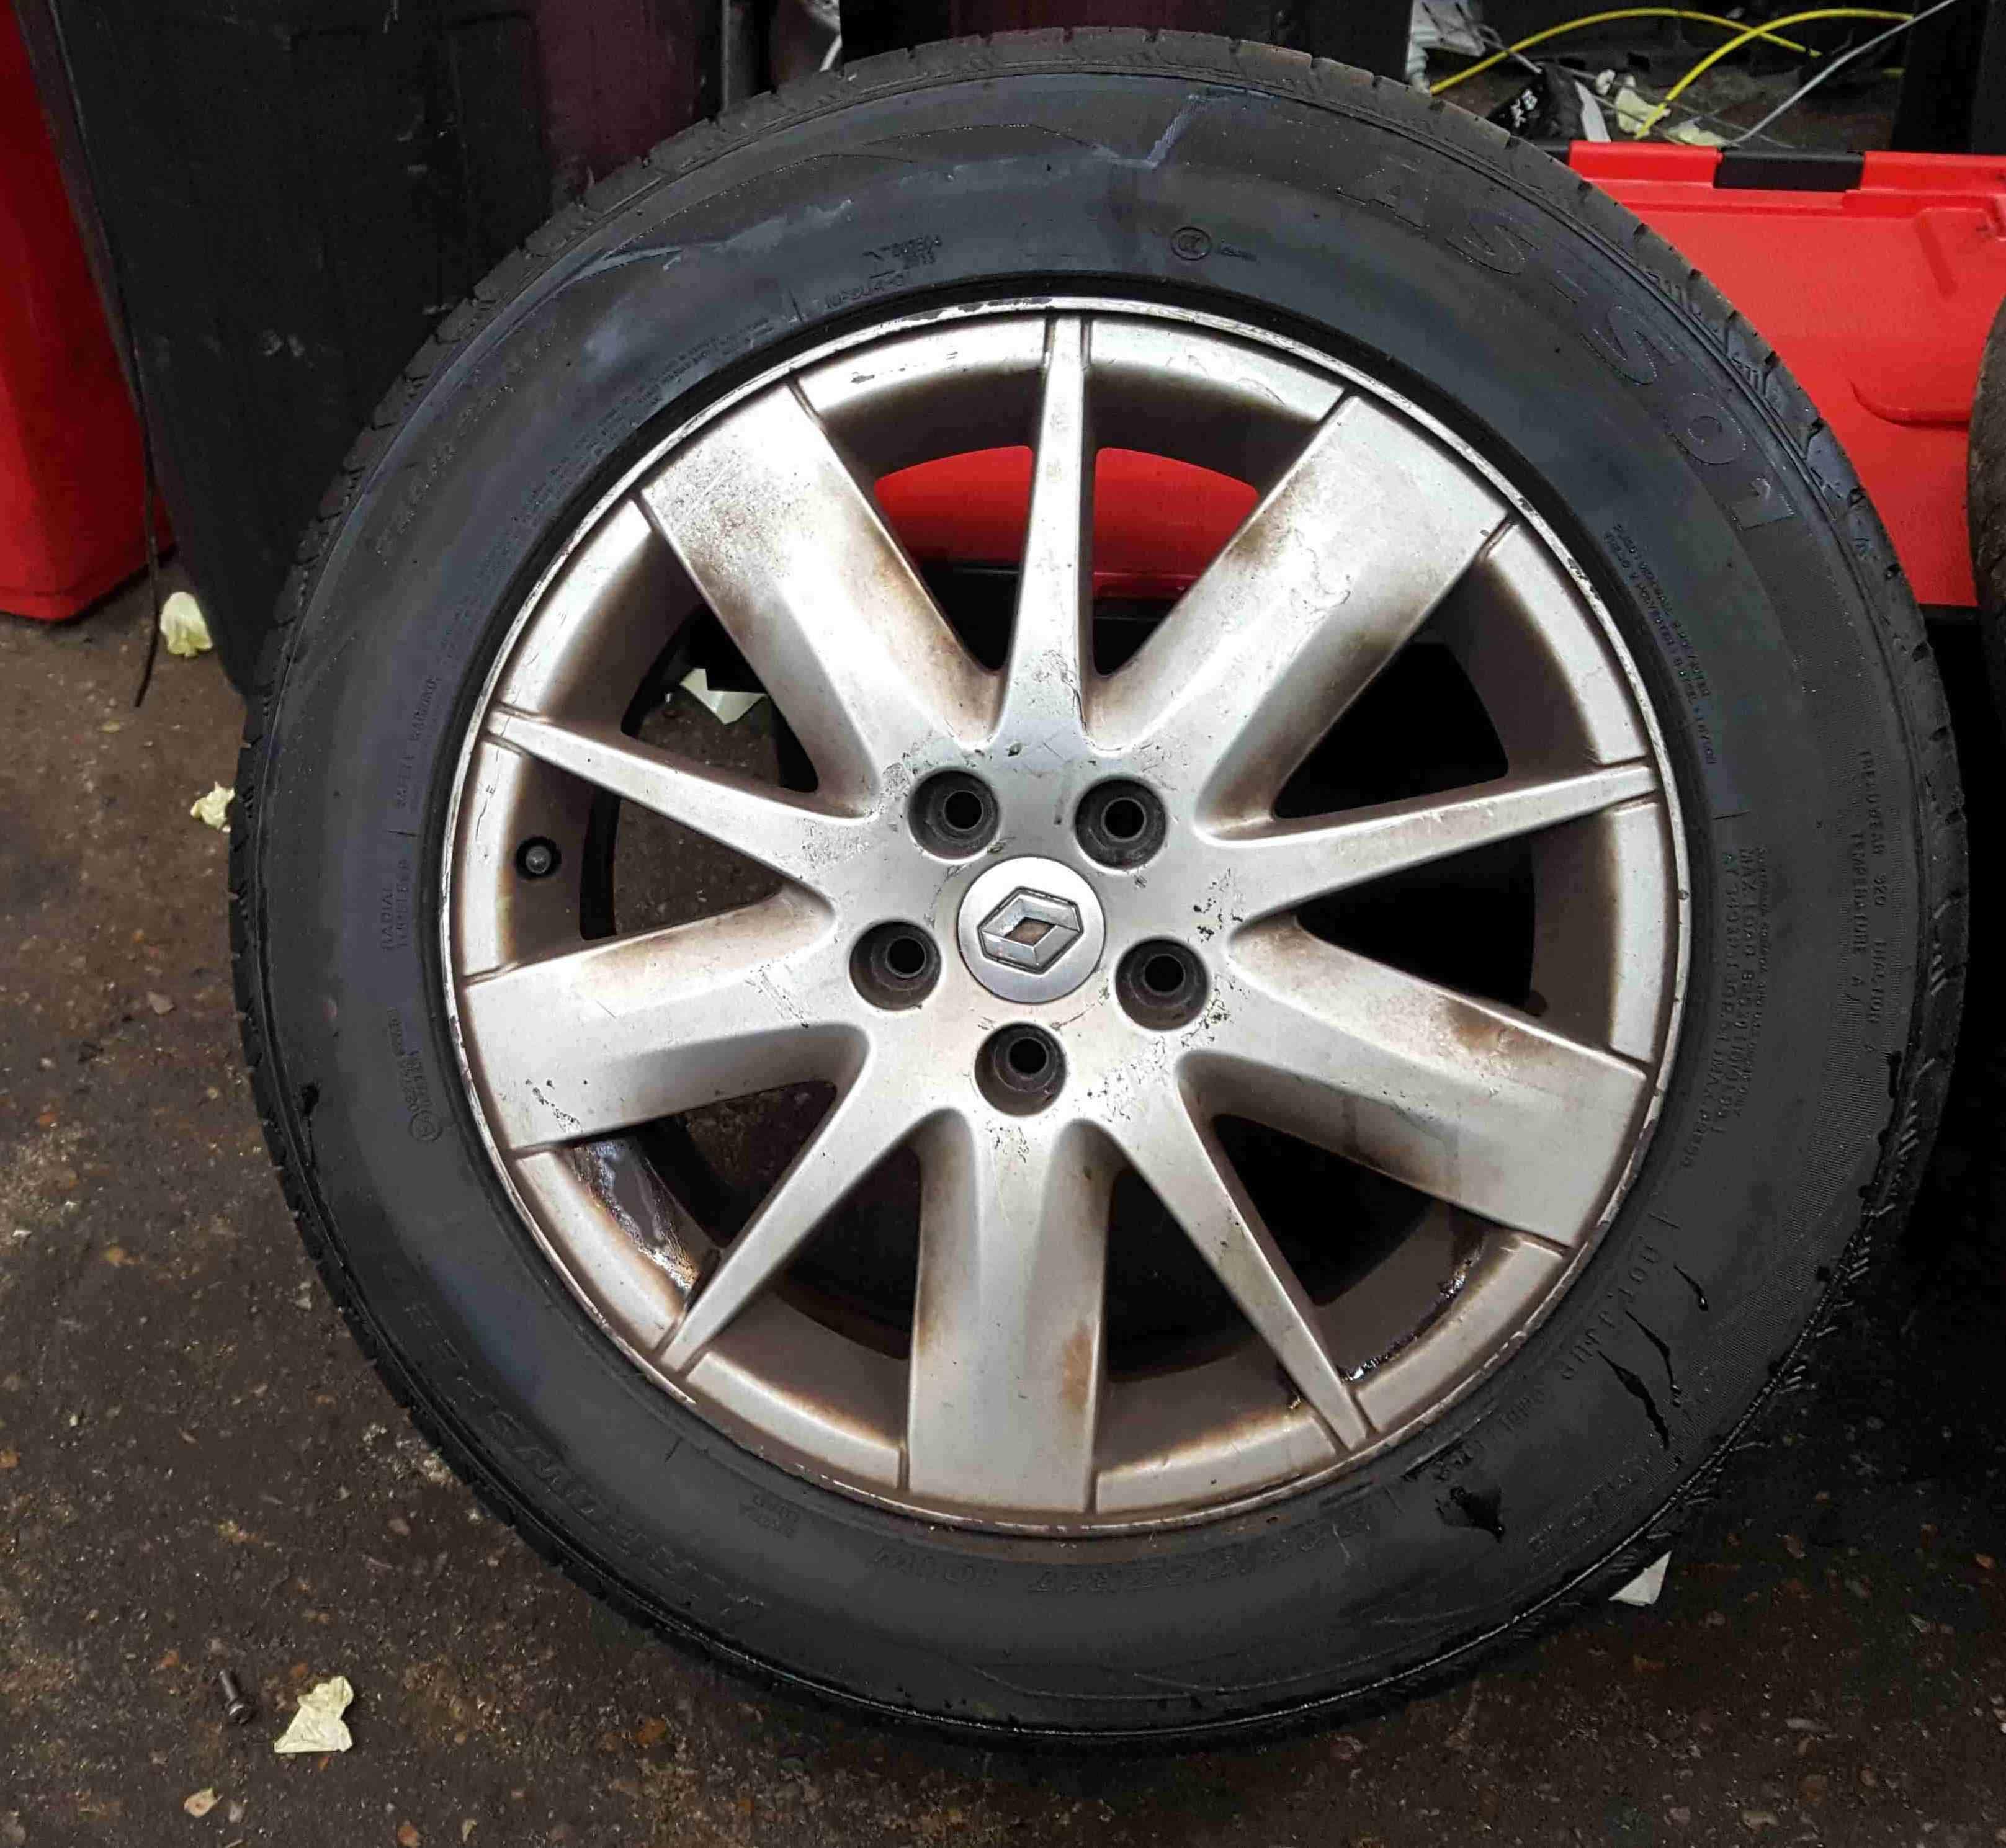 Renault Espace 2003-2013 Tellus Alloy Wheel 17inch 8200602880